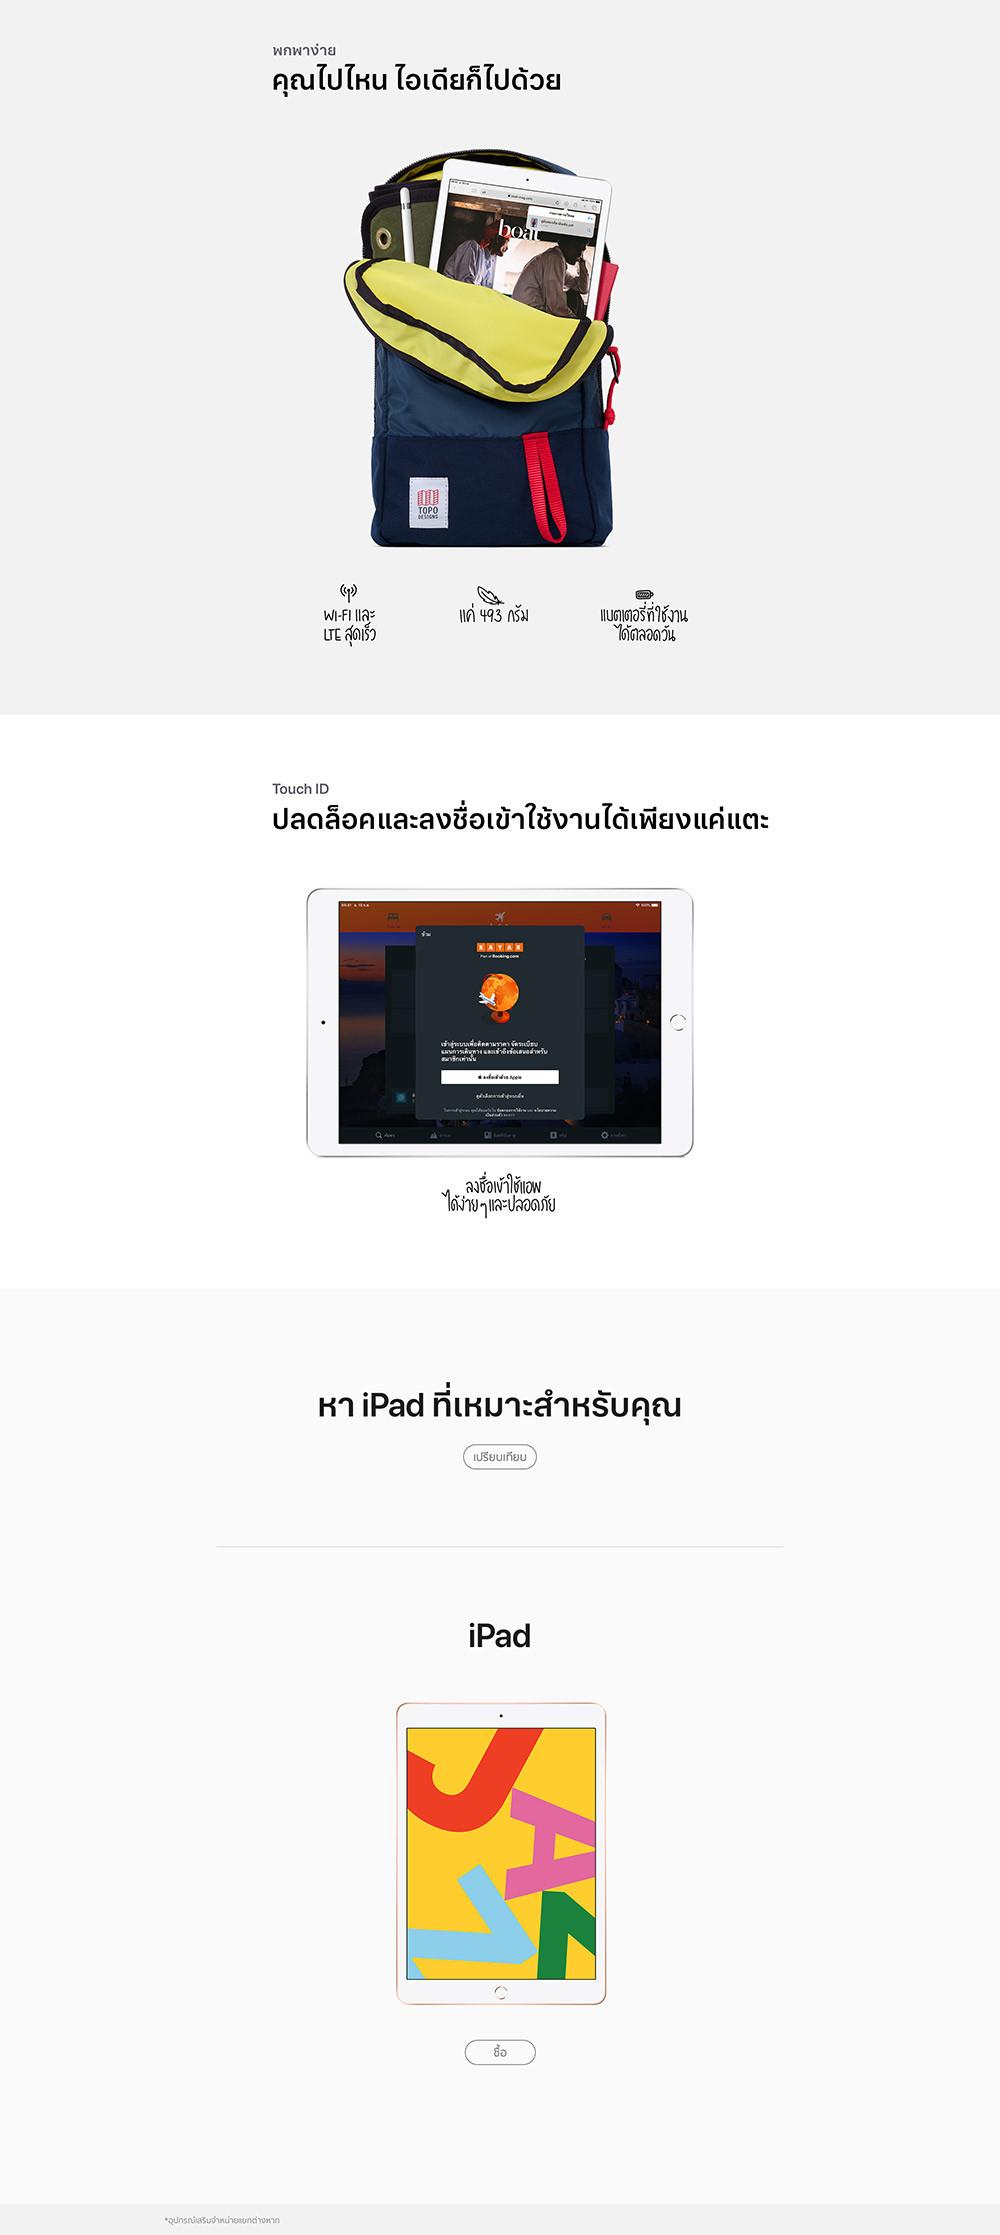 ipad-web-product-page_3_2.jpg